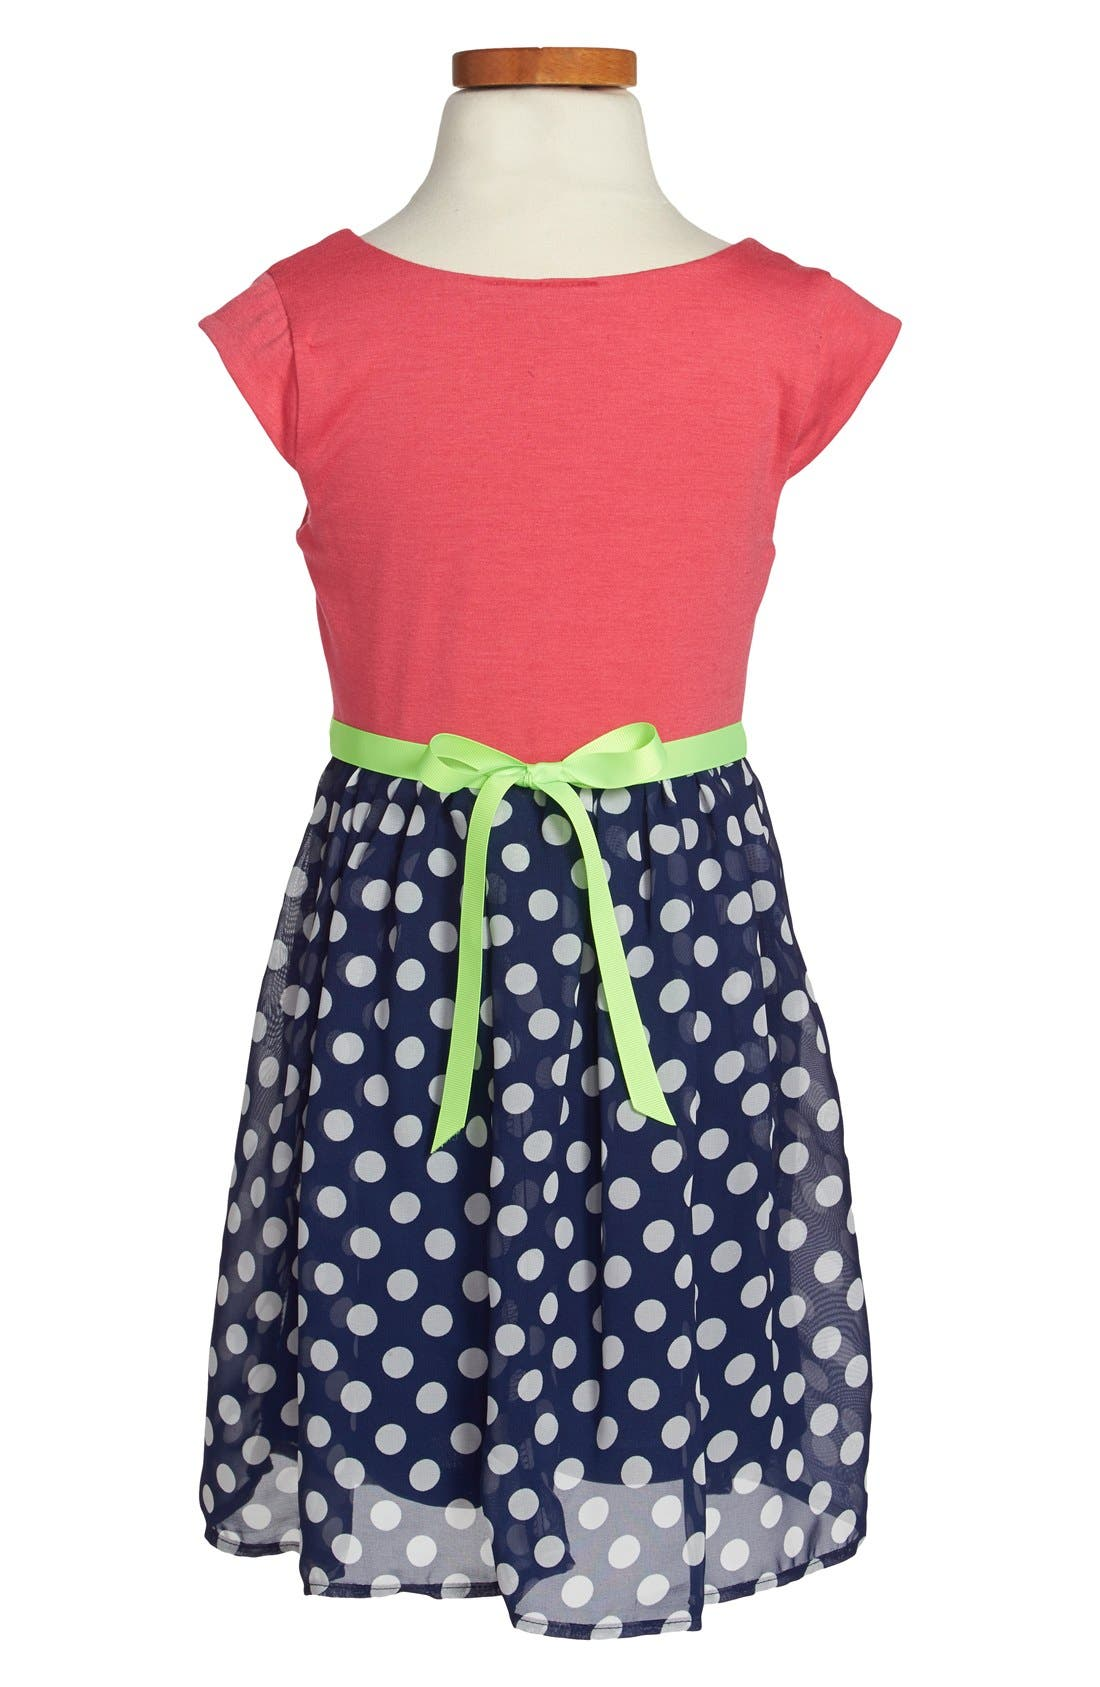 Alternate Image 2  - Zunie Cap Sleeve Floral Print Dress (Toddler Girls, Little Girls & Big Girls)